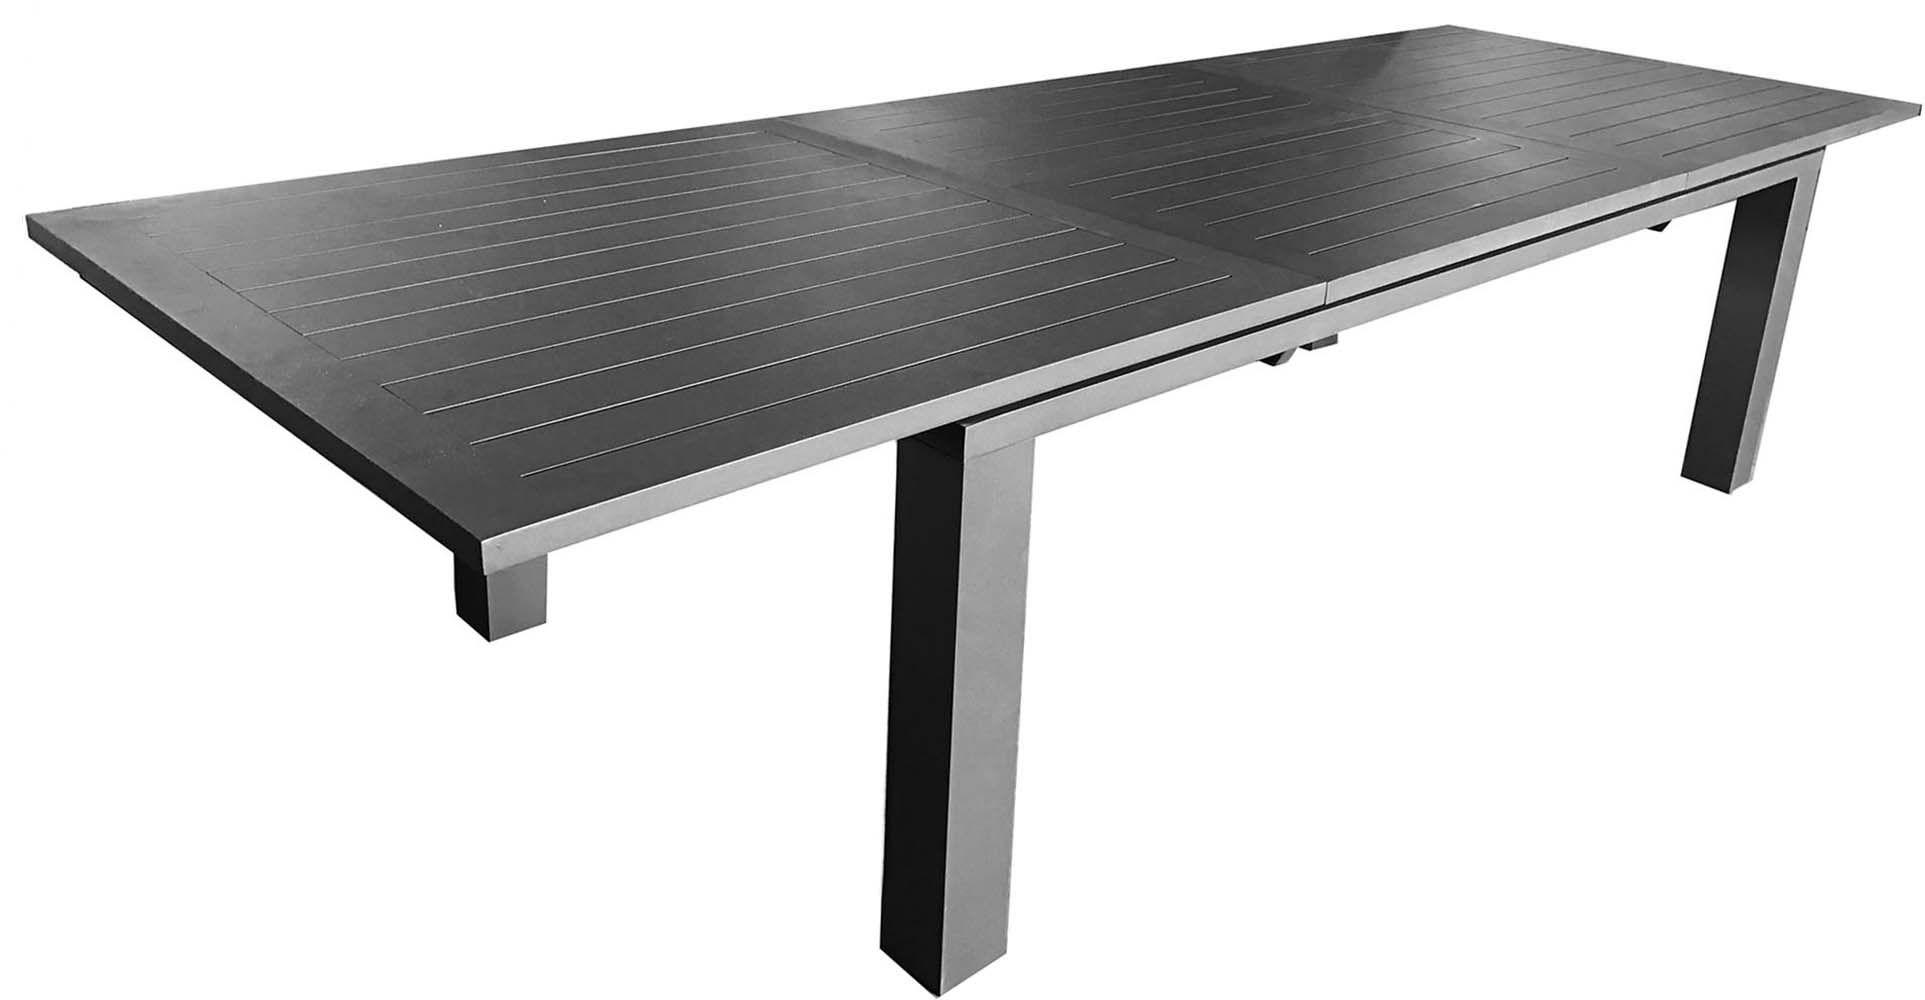 table en aluminium avec allonge elisa 240 cm gris. Black Bedroom Furniture Sets. Home Design Ideas